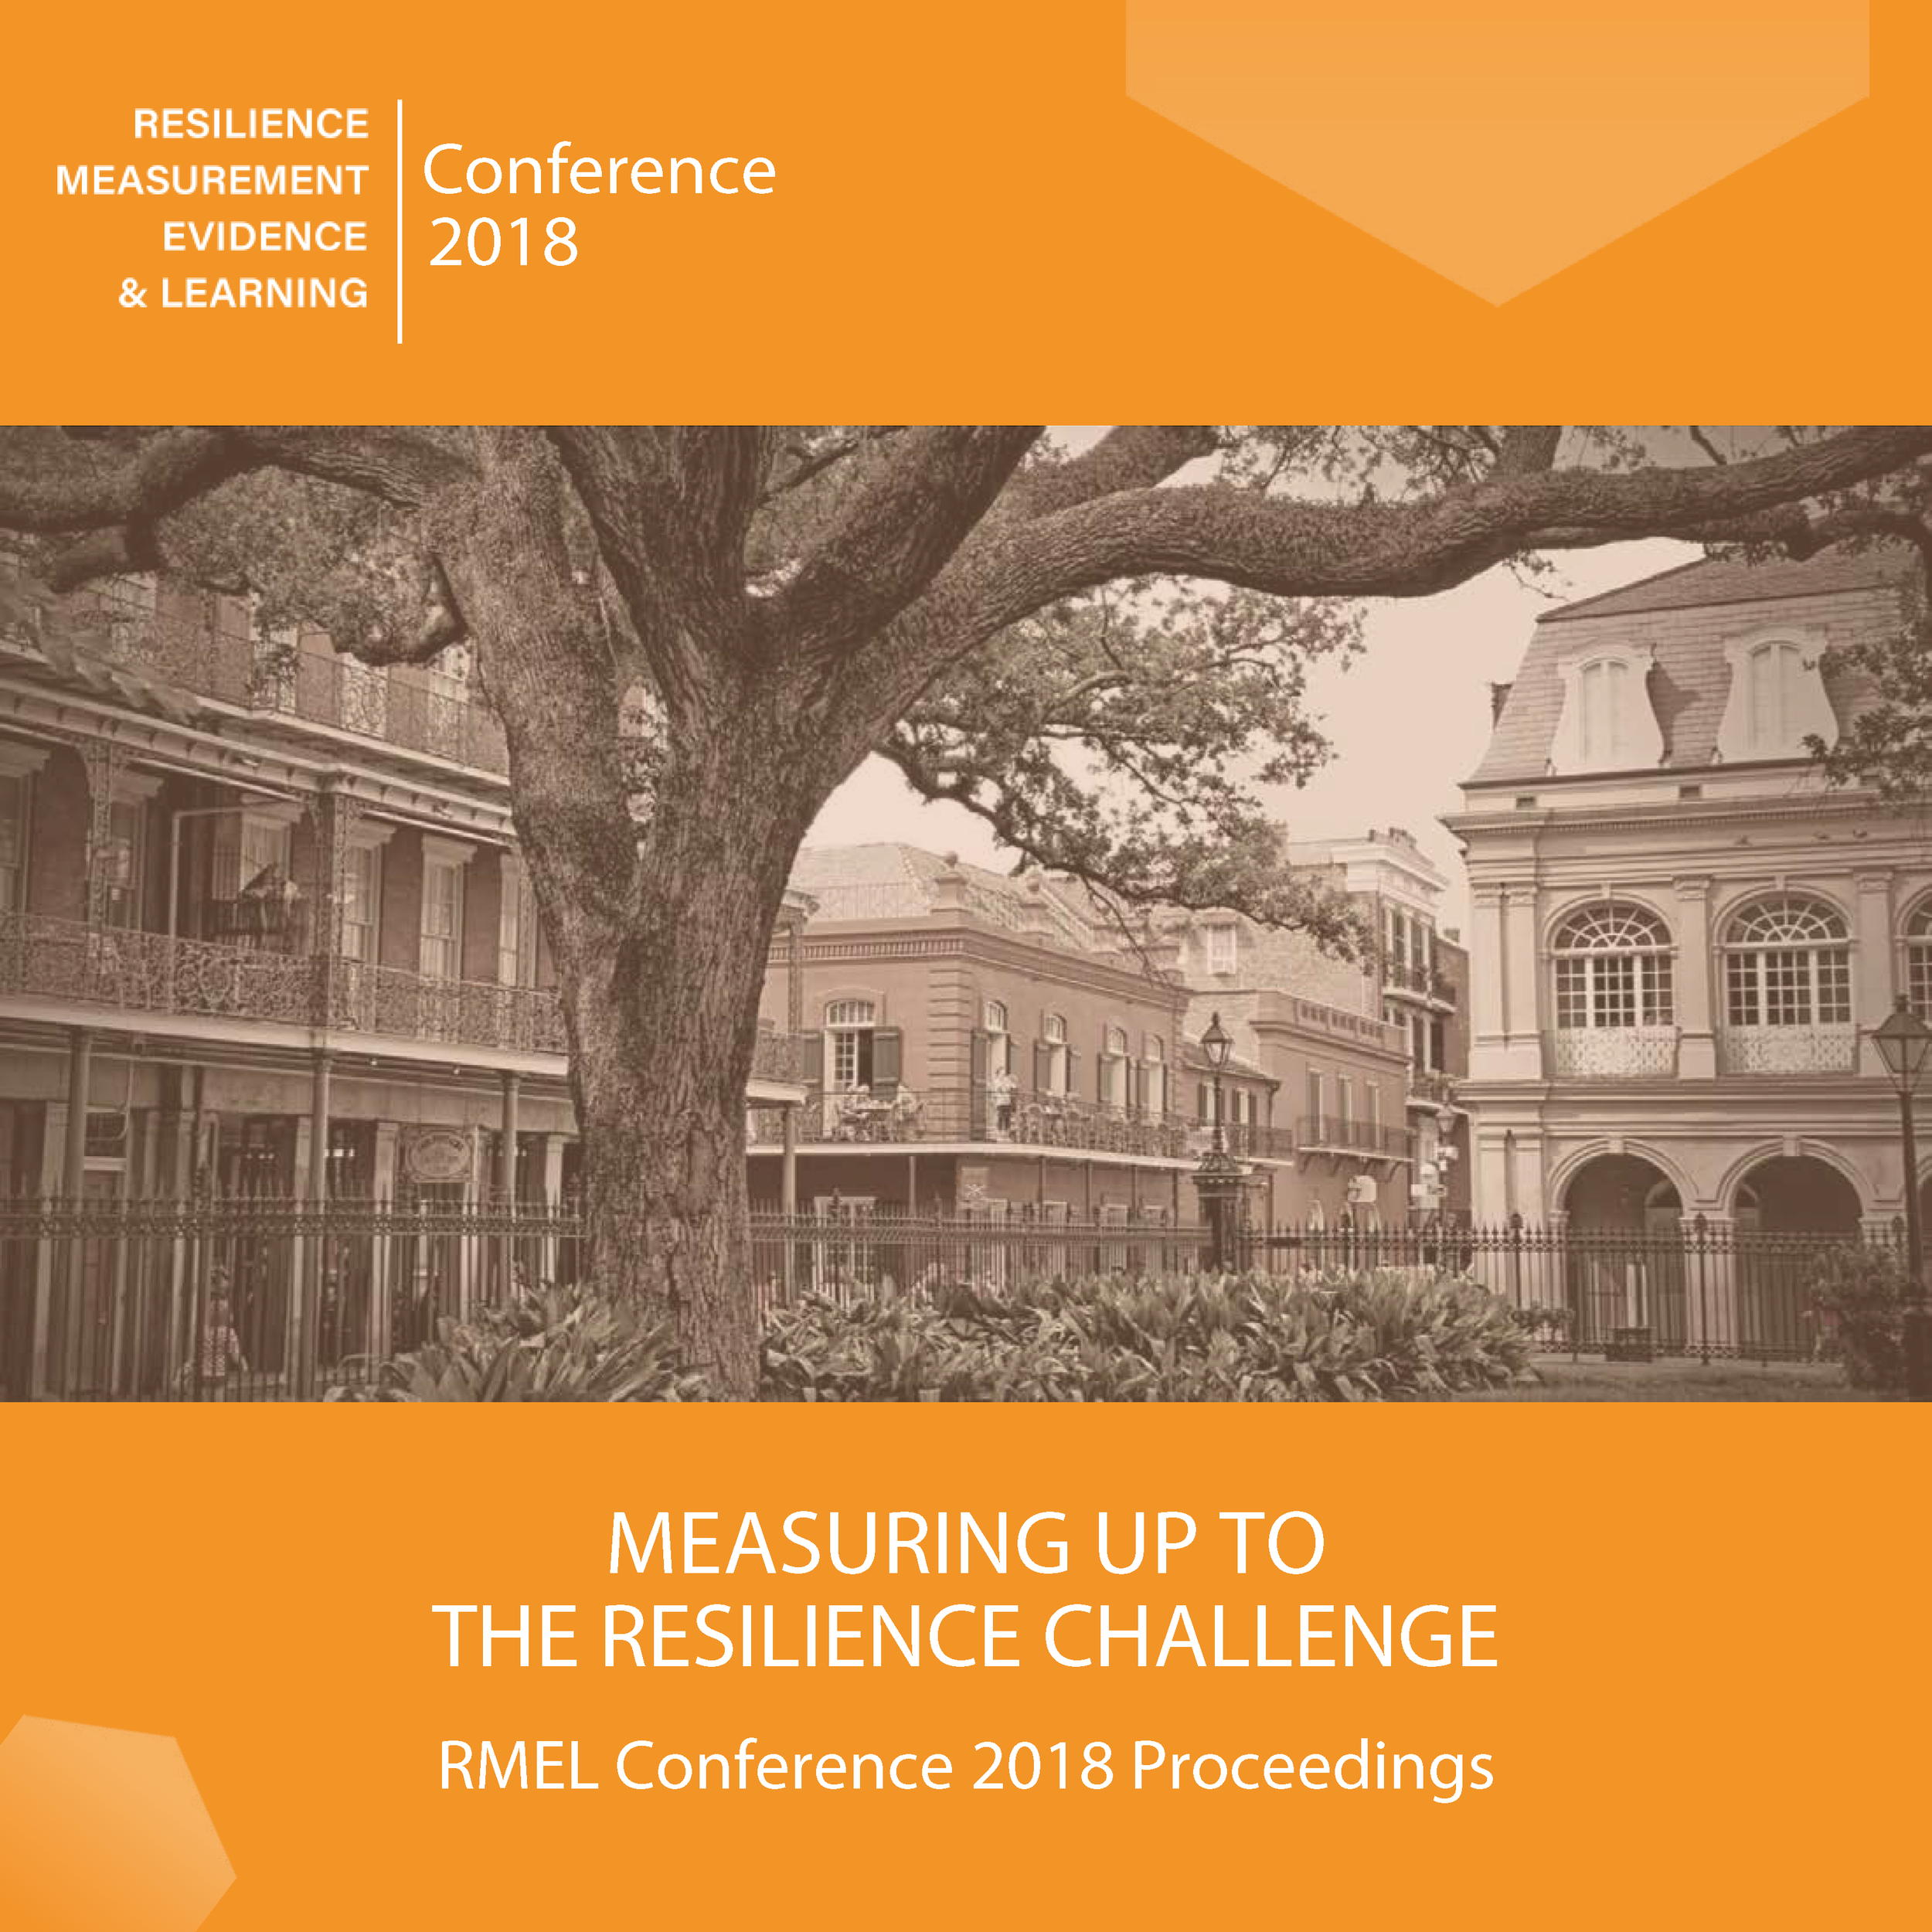 RMEL Convening Proceedings 6.27.png